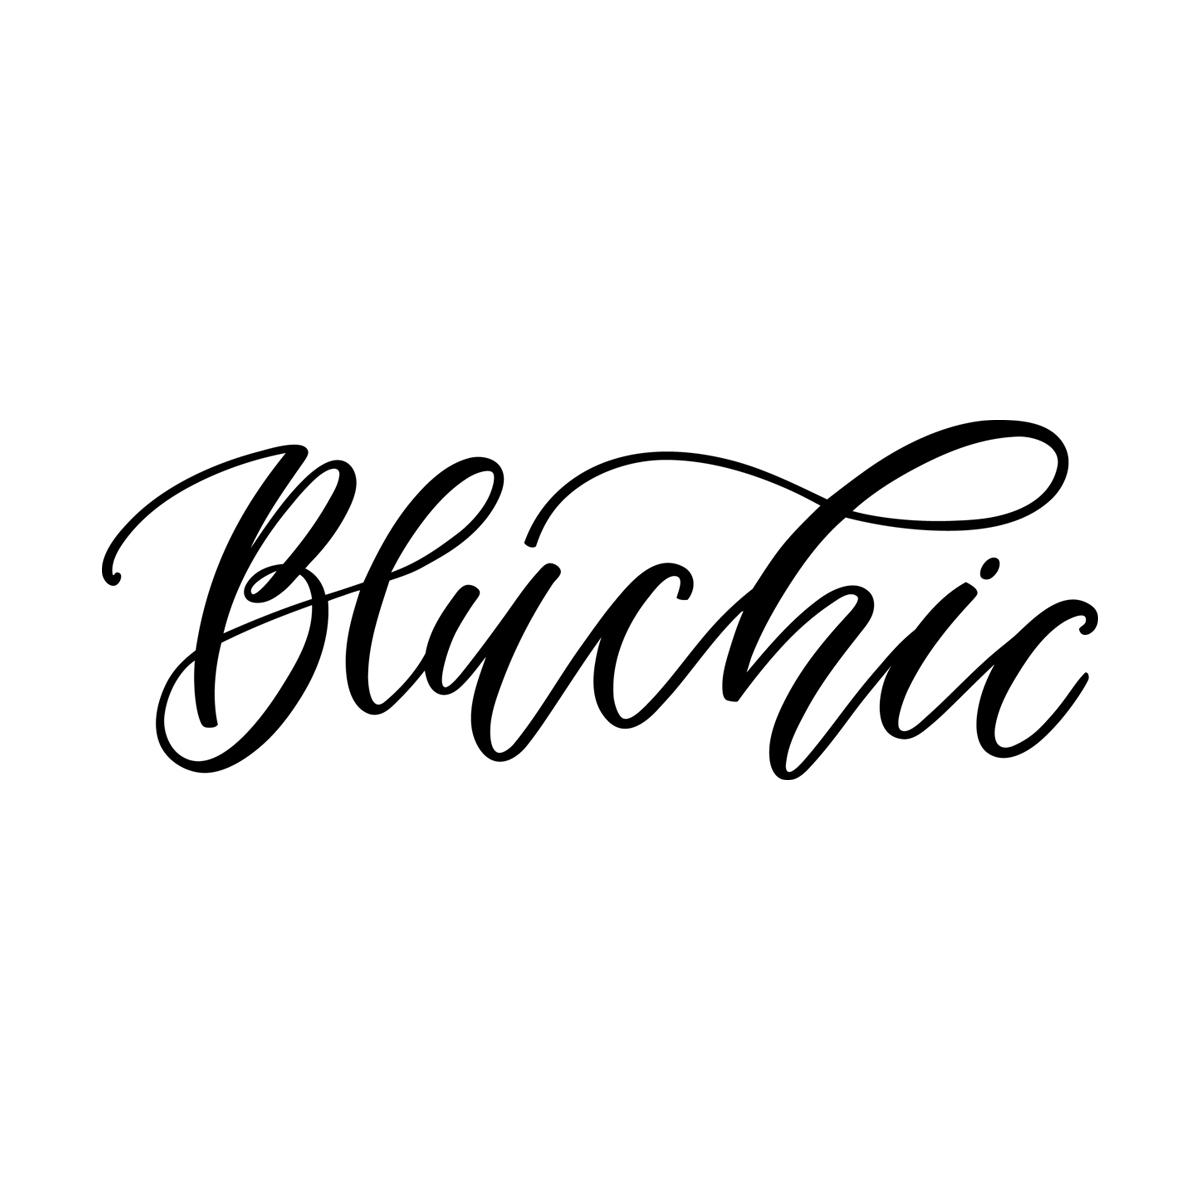 Bluchic hand-lettered logo